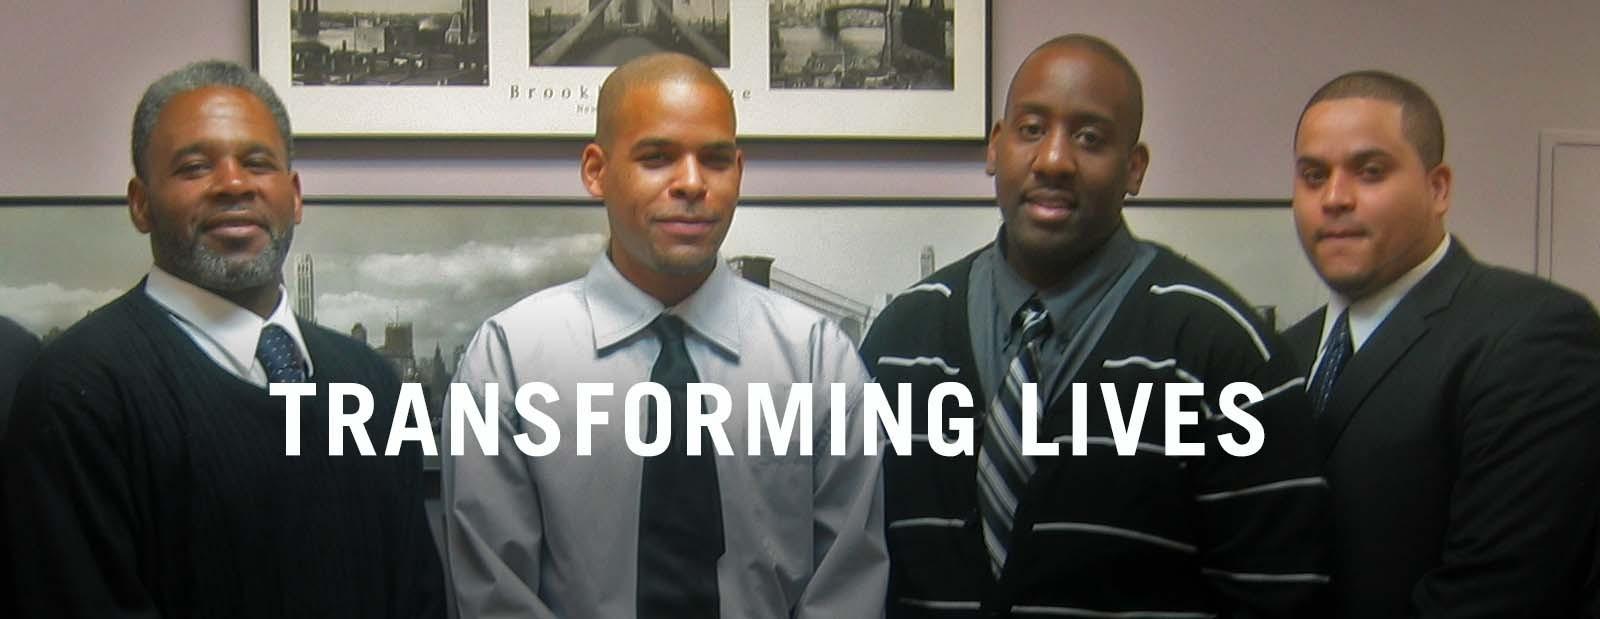 7-transforming-lives_opt